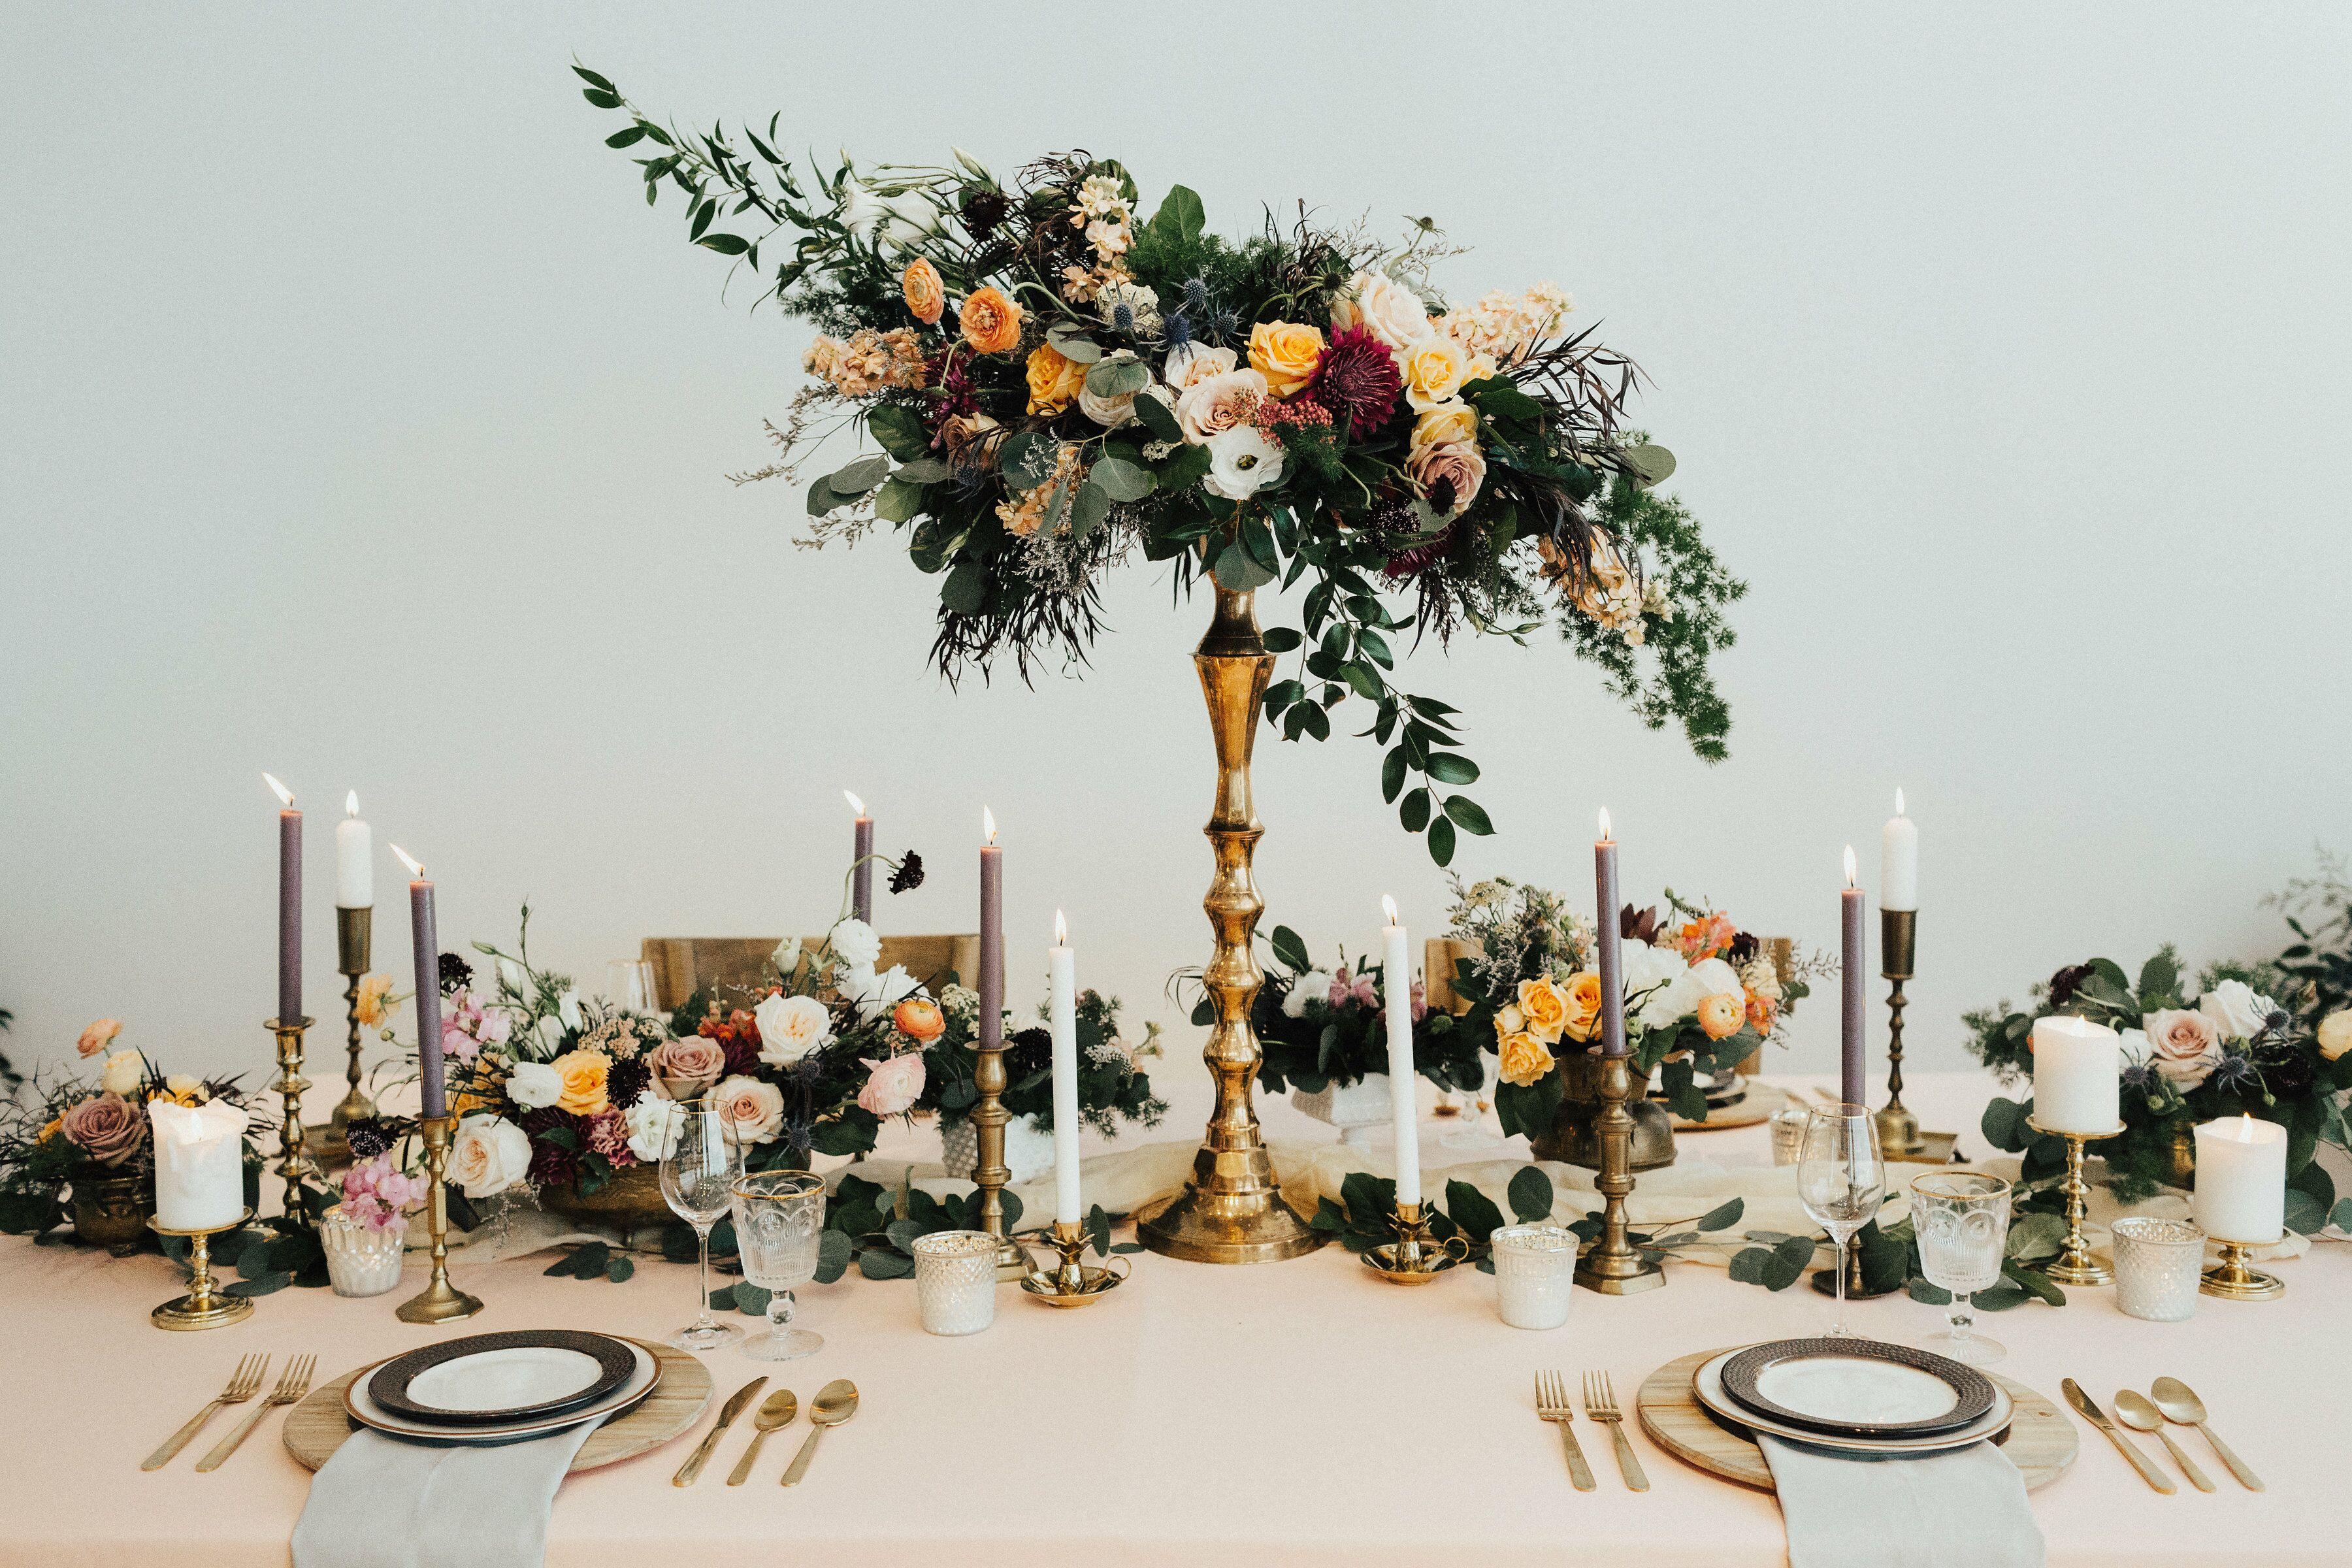 Heart Soul Floral Design Studio Florists Merriam Ks